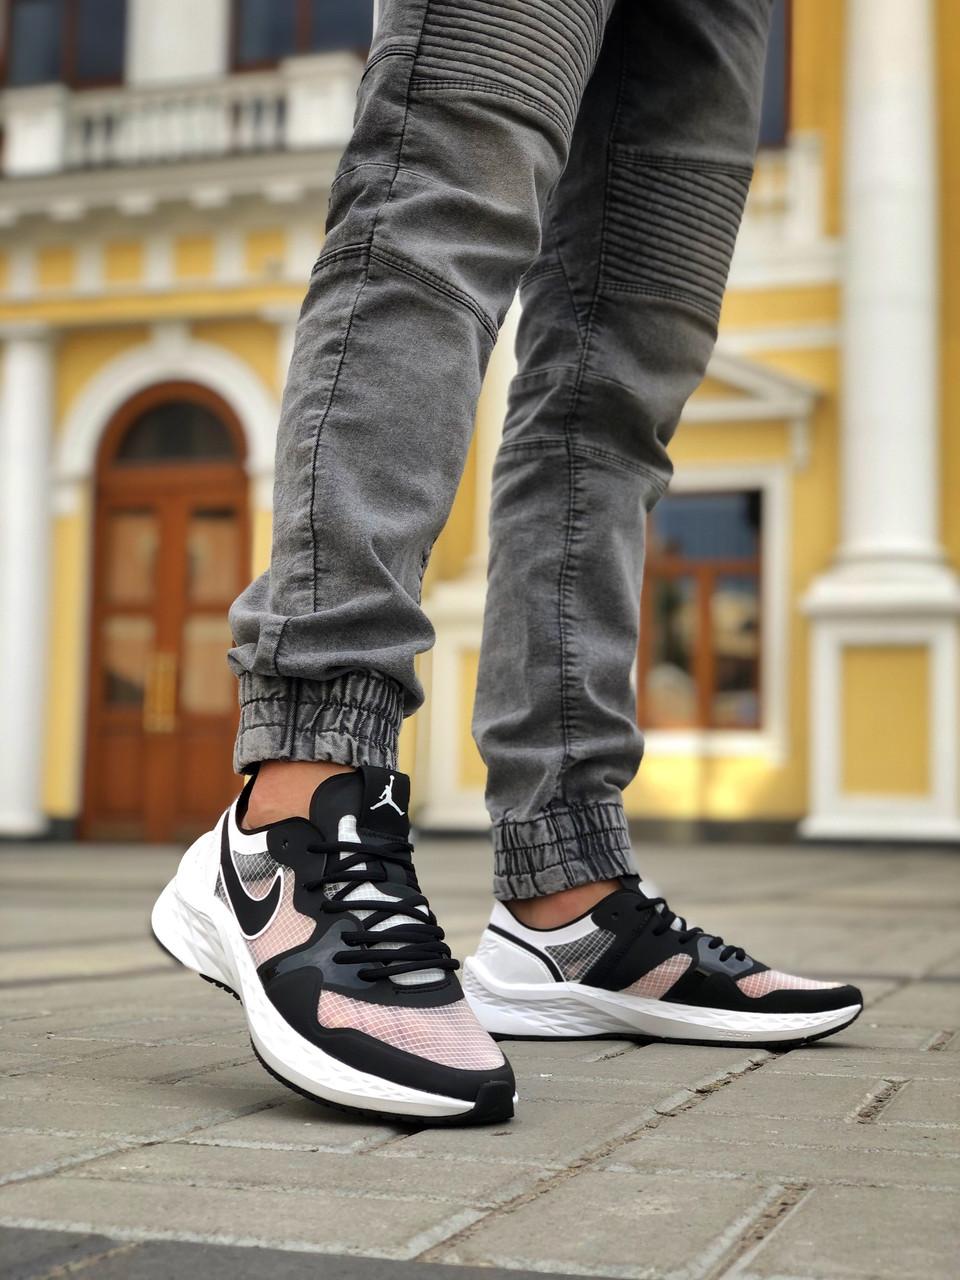 Мужские летние Кроссовки Nike Jordan Air Zoom 85